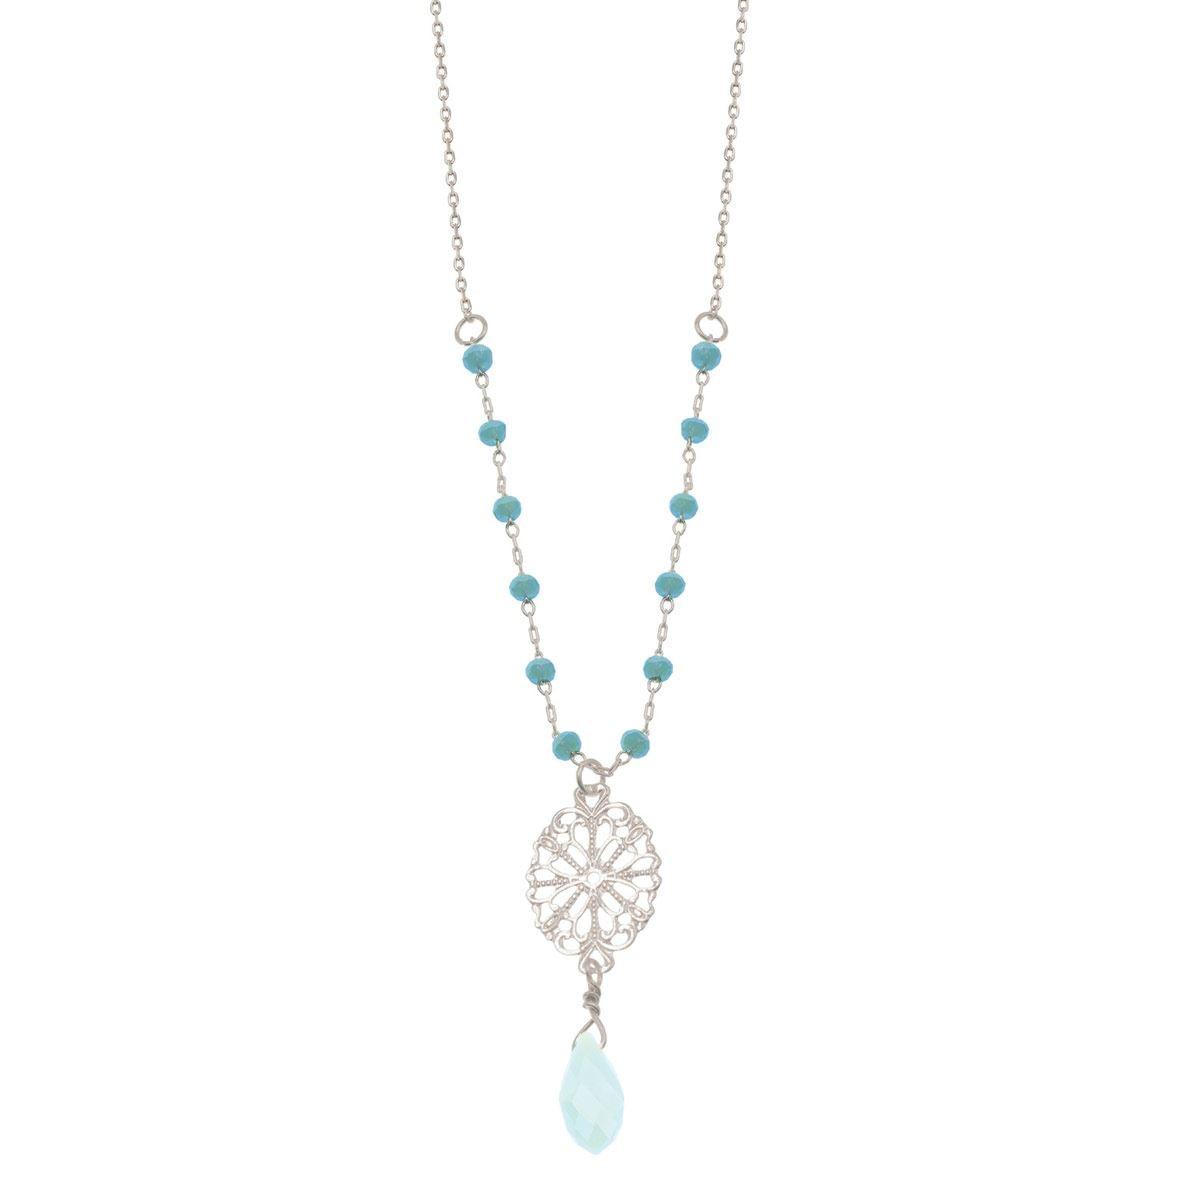 Dije largo en acabado plata con filigrana beads color turquesa Adrianne Picard